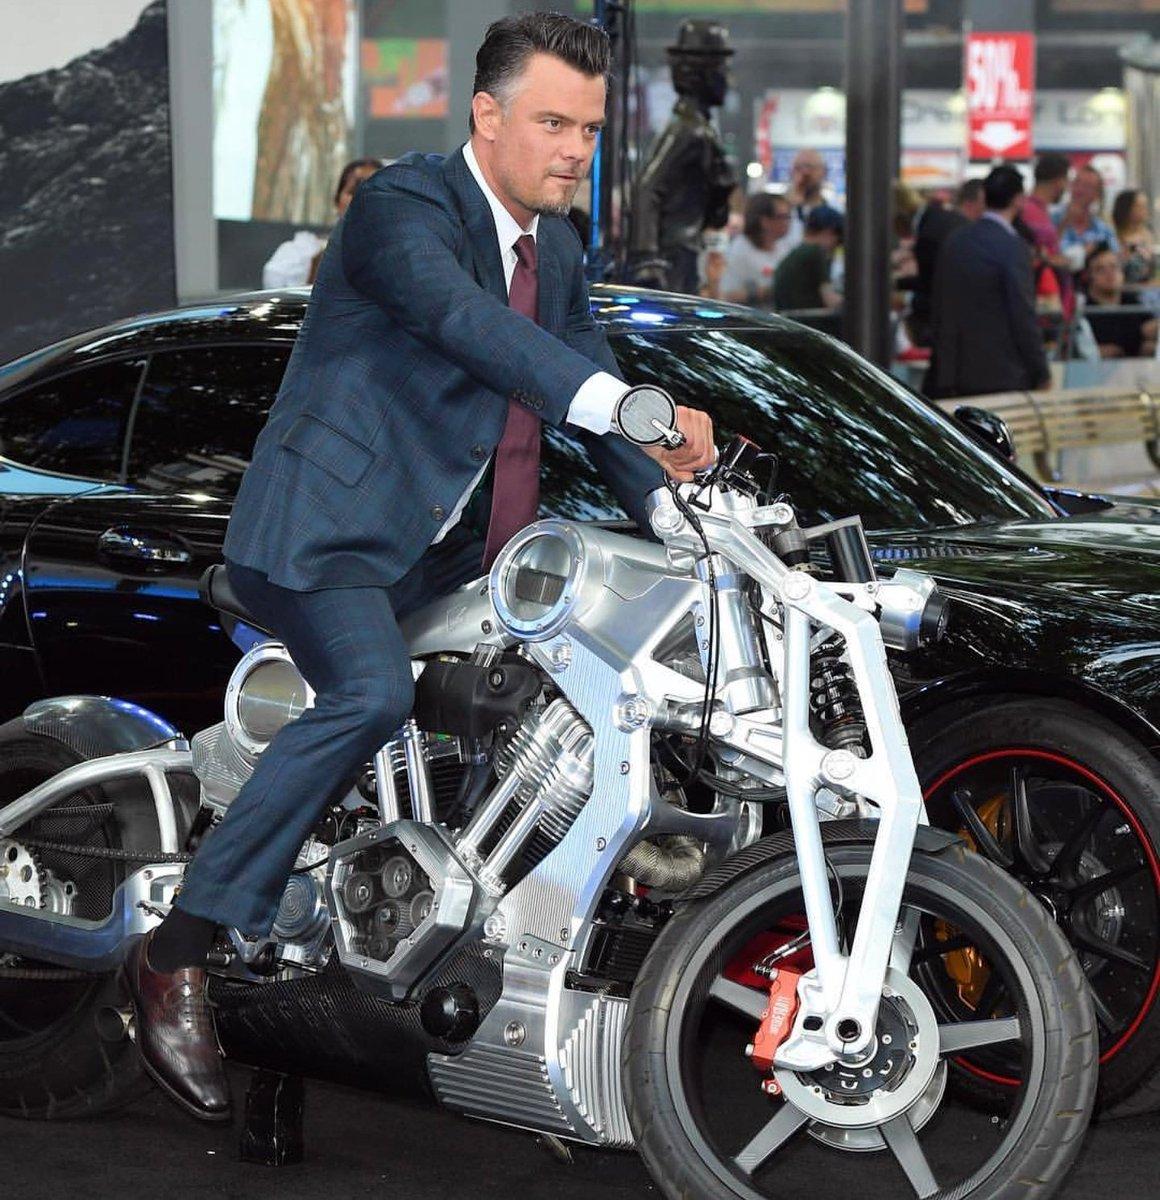 Josh Duhamel Wearing Really Nice Suit Again